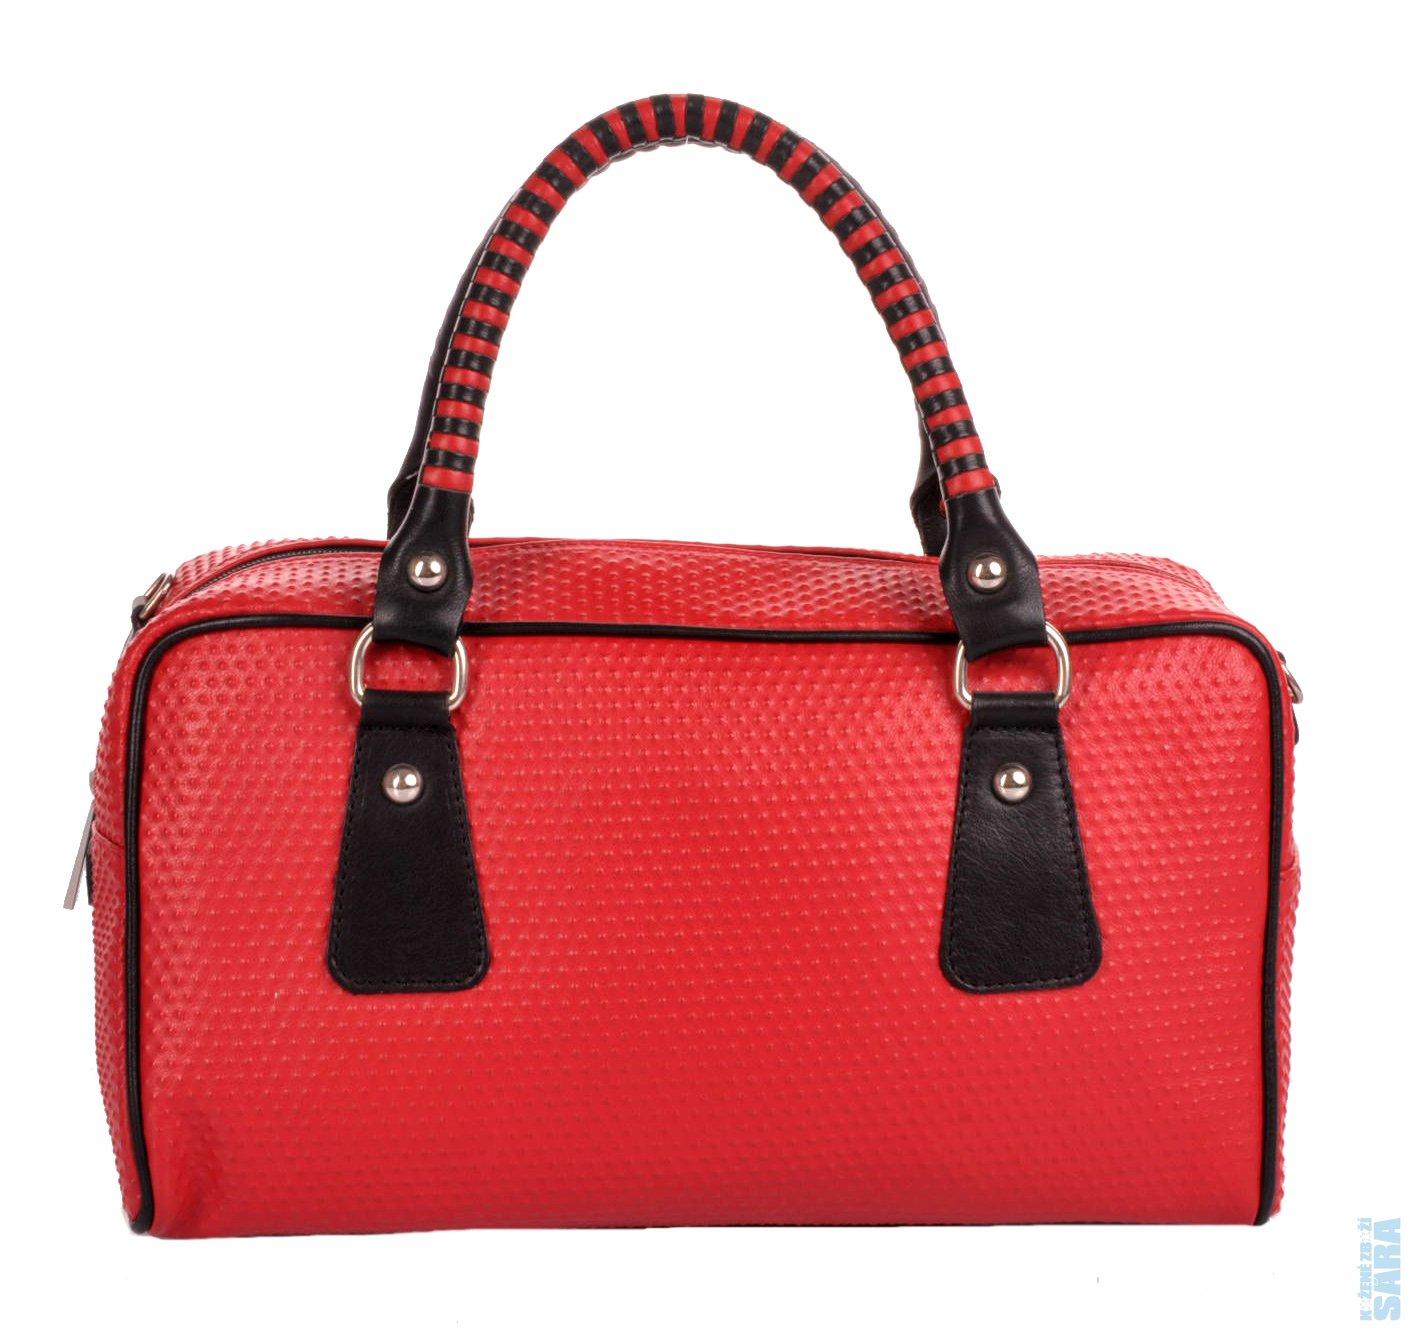 Dámská kožená kabelka 42177 červeno černá b989e85c3de